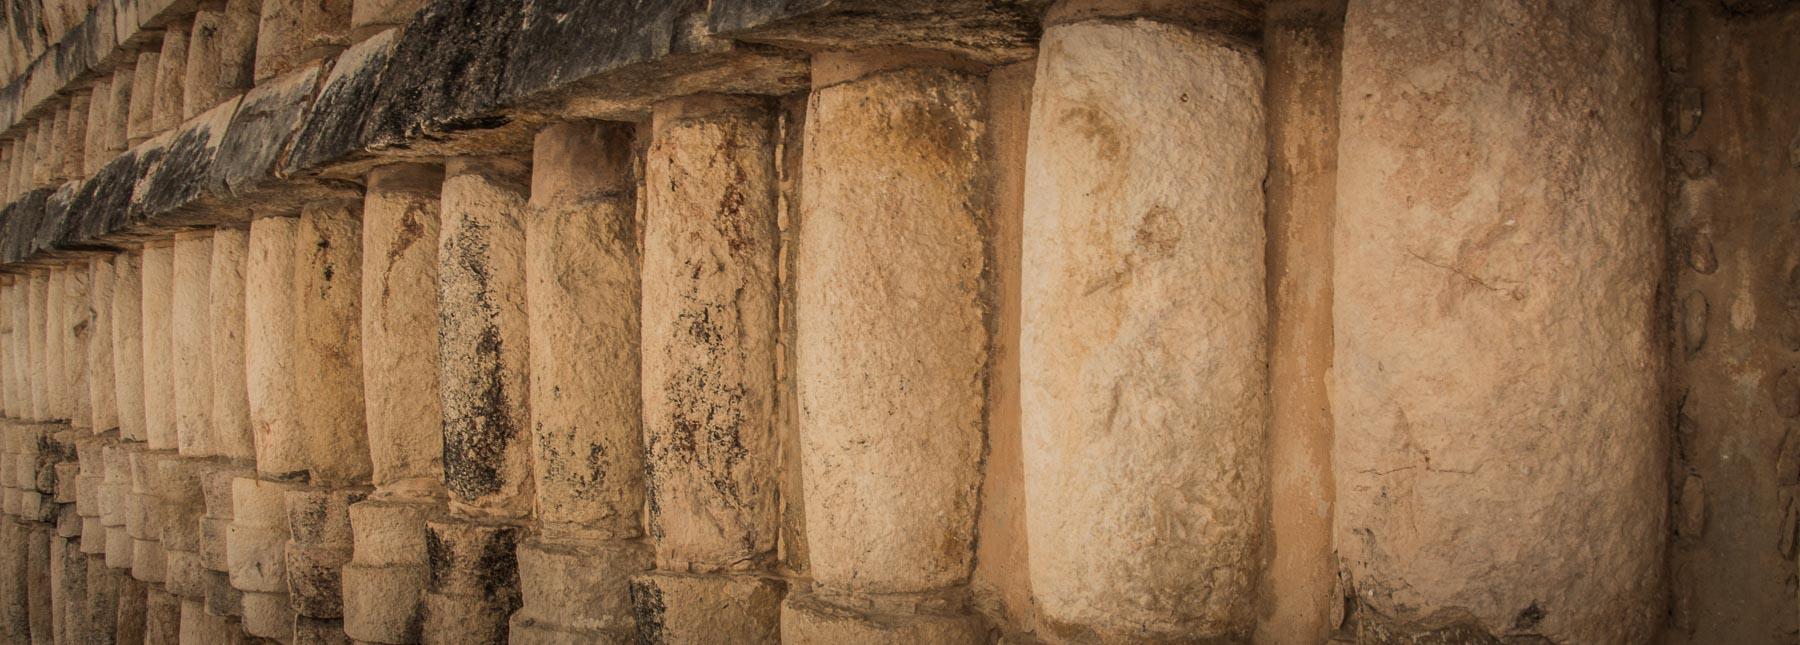 A row of columns on an Uxmal temple.